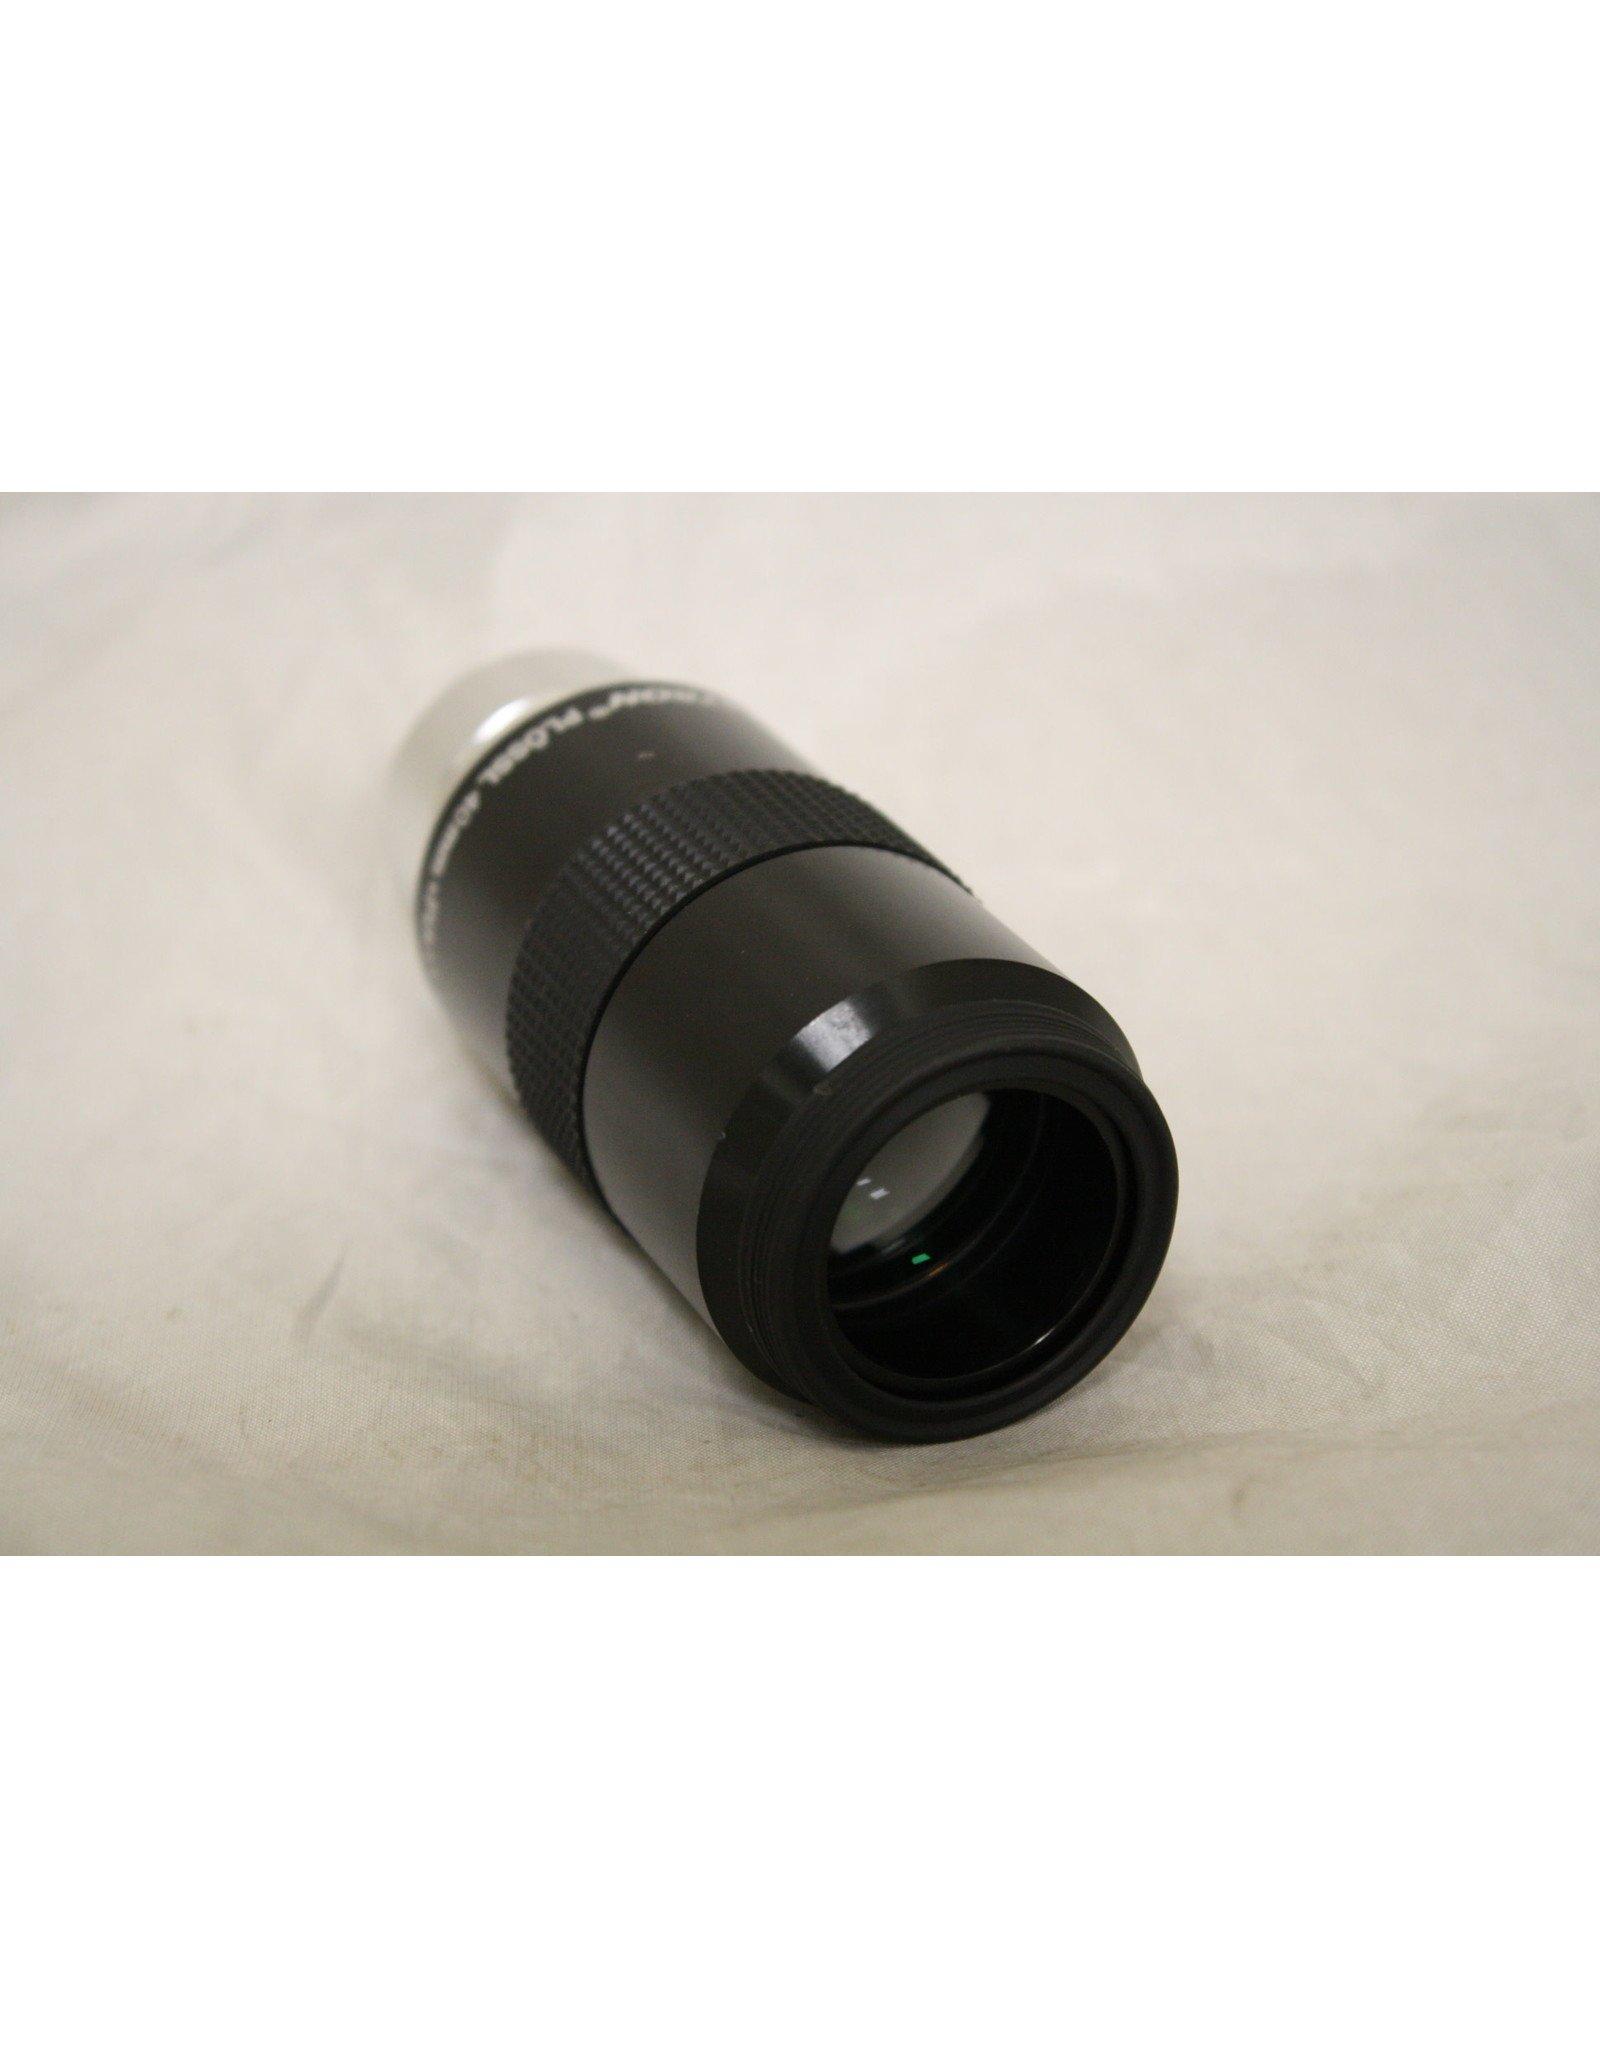 Celestron Celestron 40mm Plossl Eyepiece for Evolution